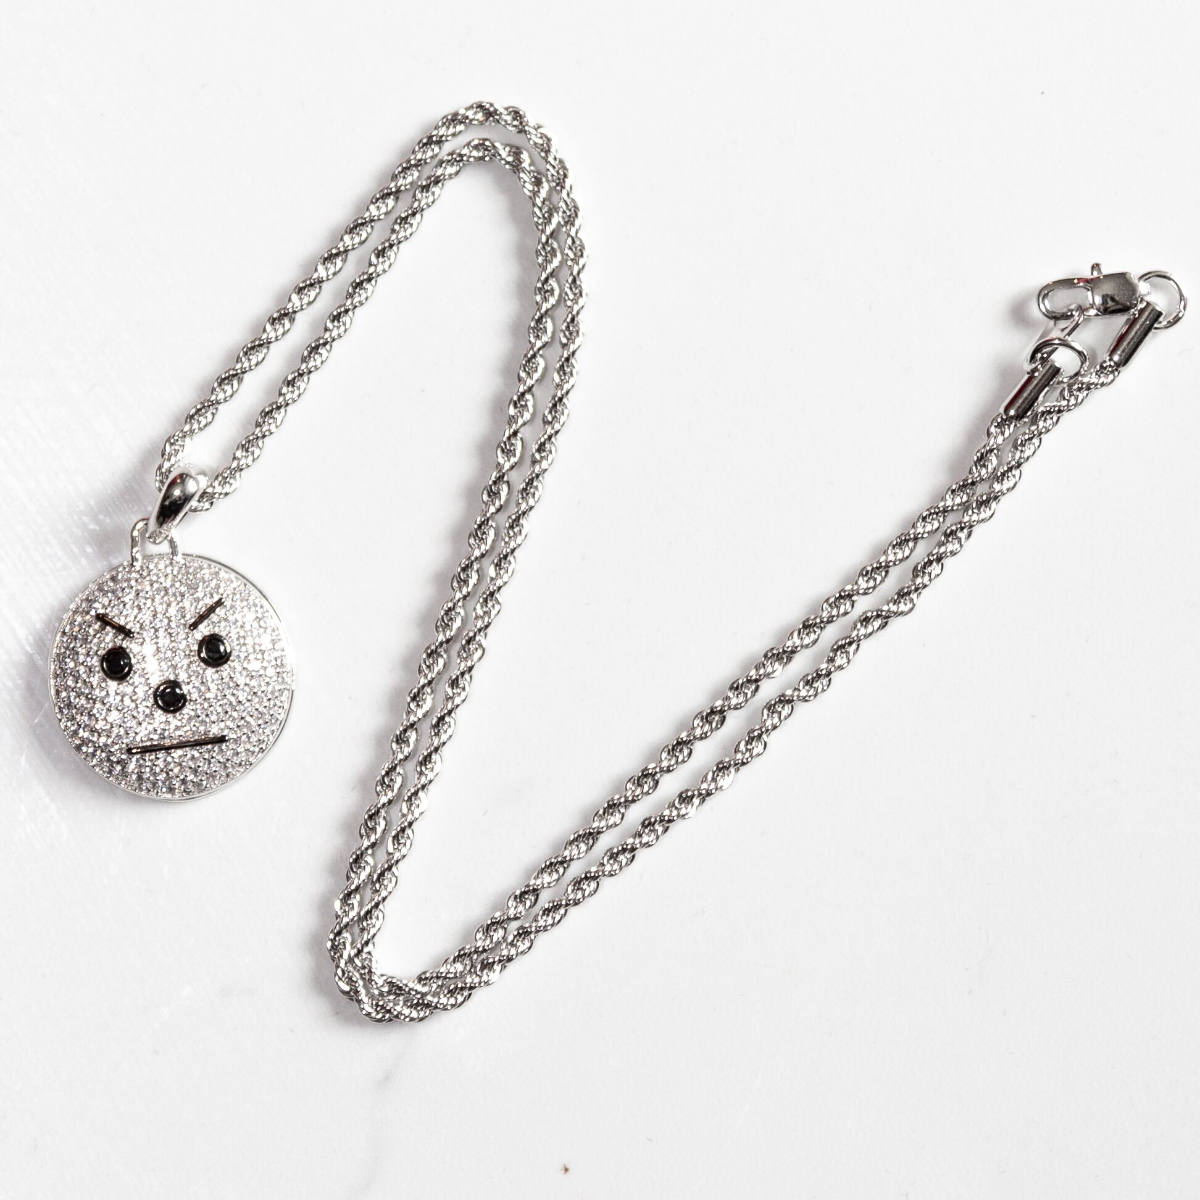 Snowman Emoji Pendant and Chain (White Gold) & TM104 Album Download Bundle